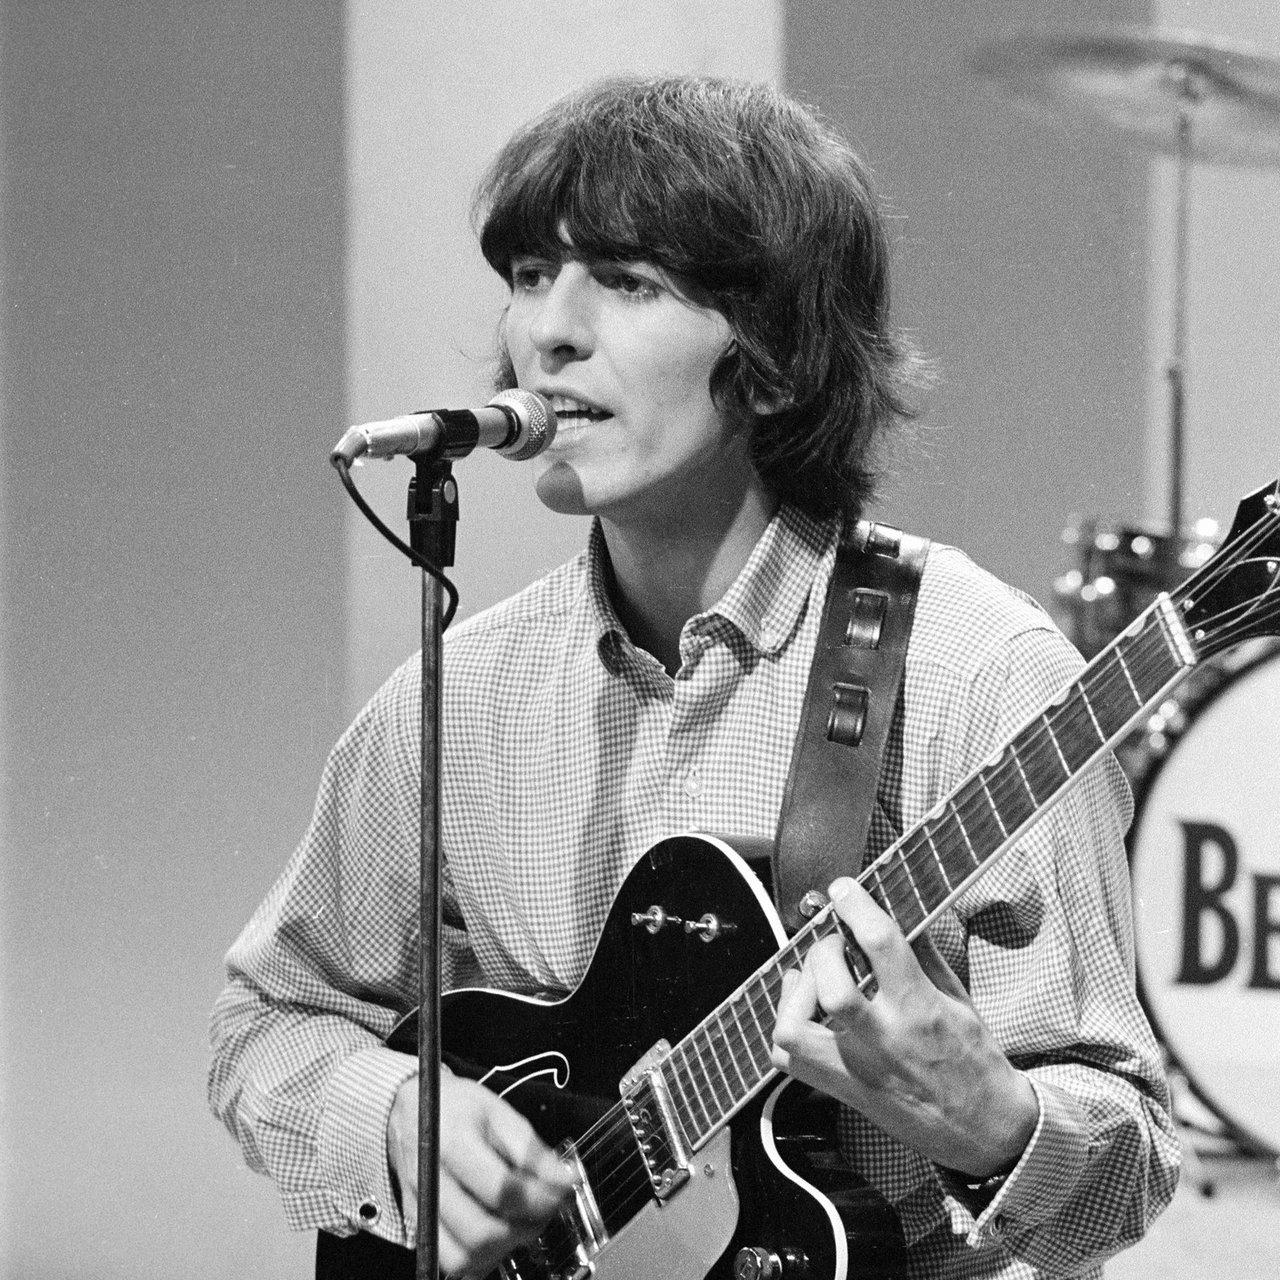 Purple Patty's Photoblog: The George Harrison day spam! George Harrison